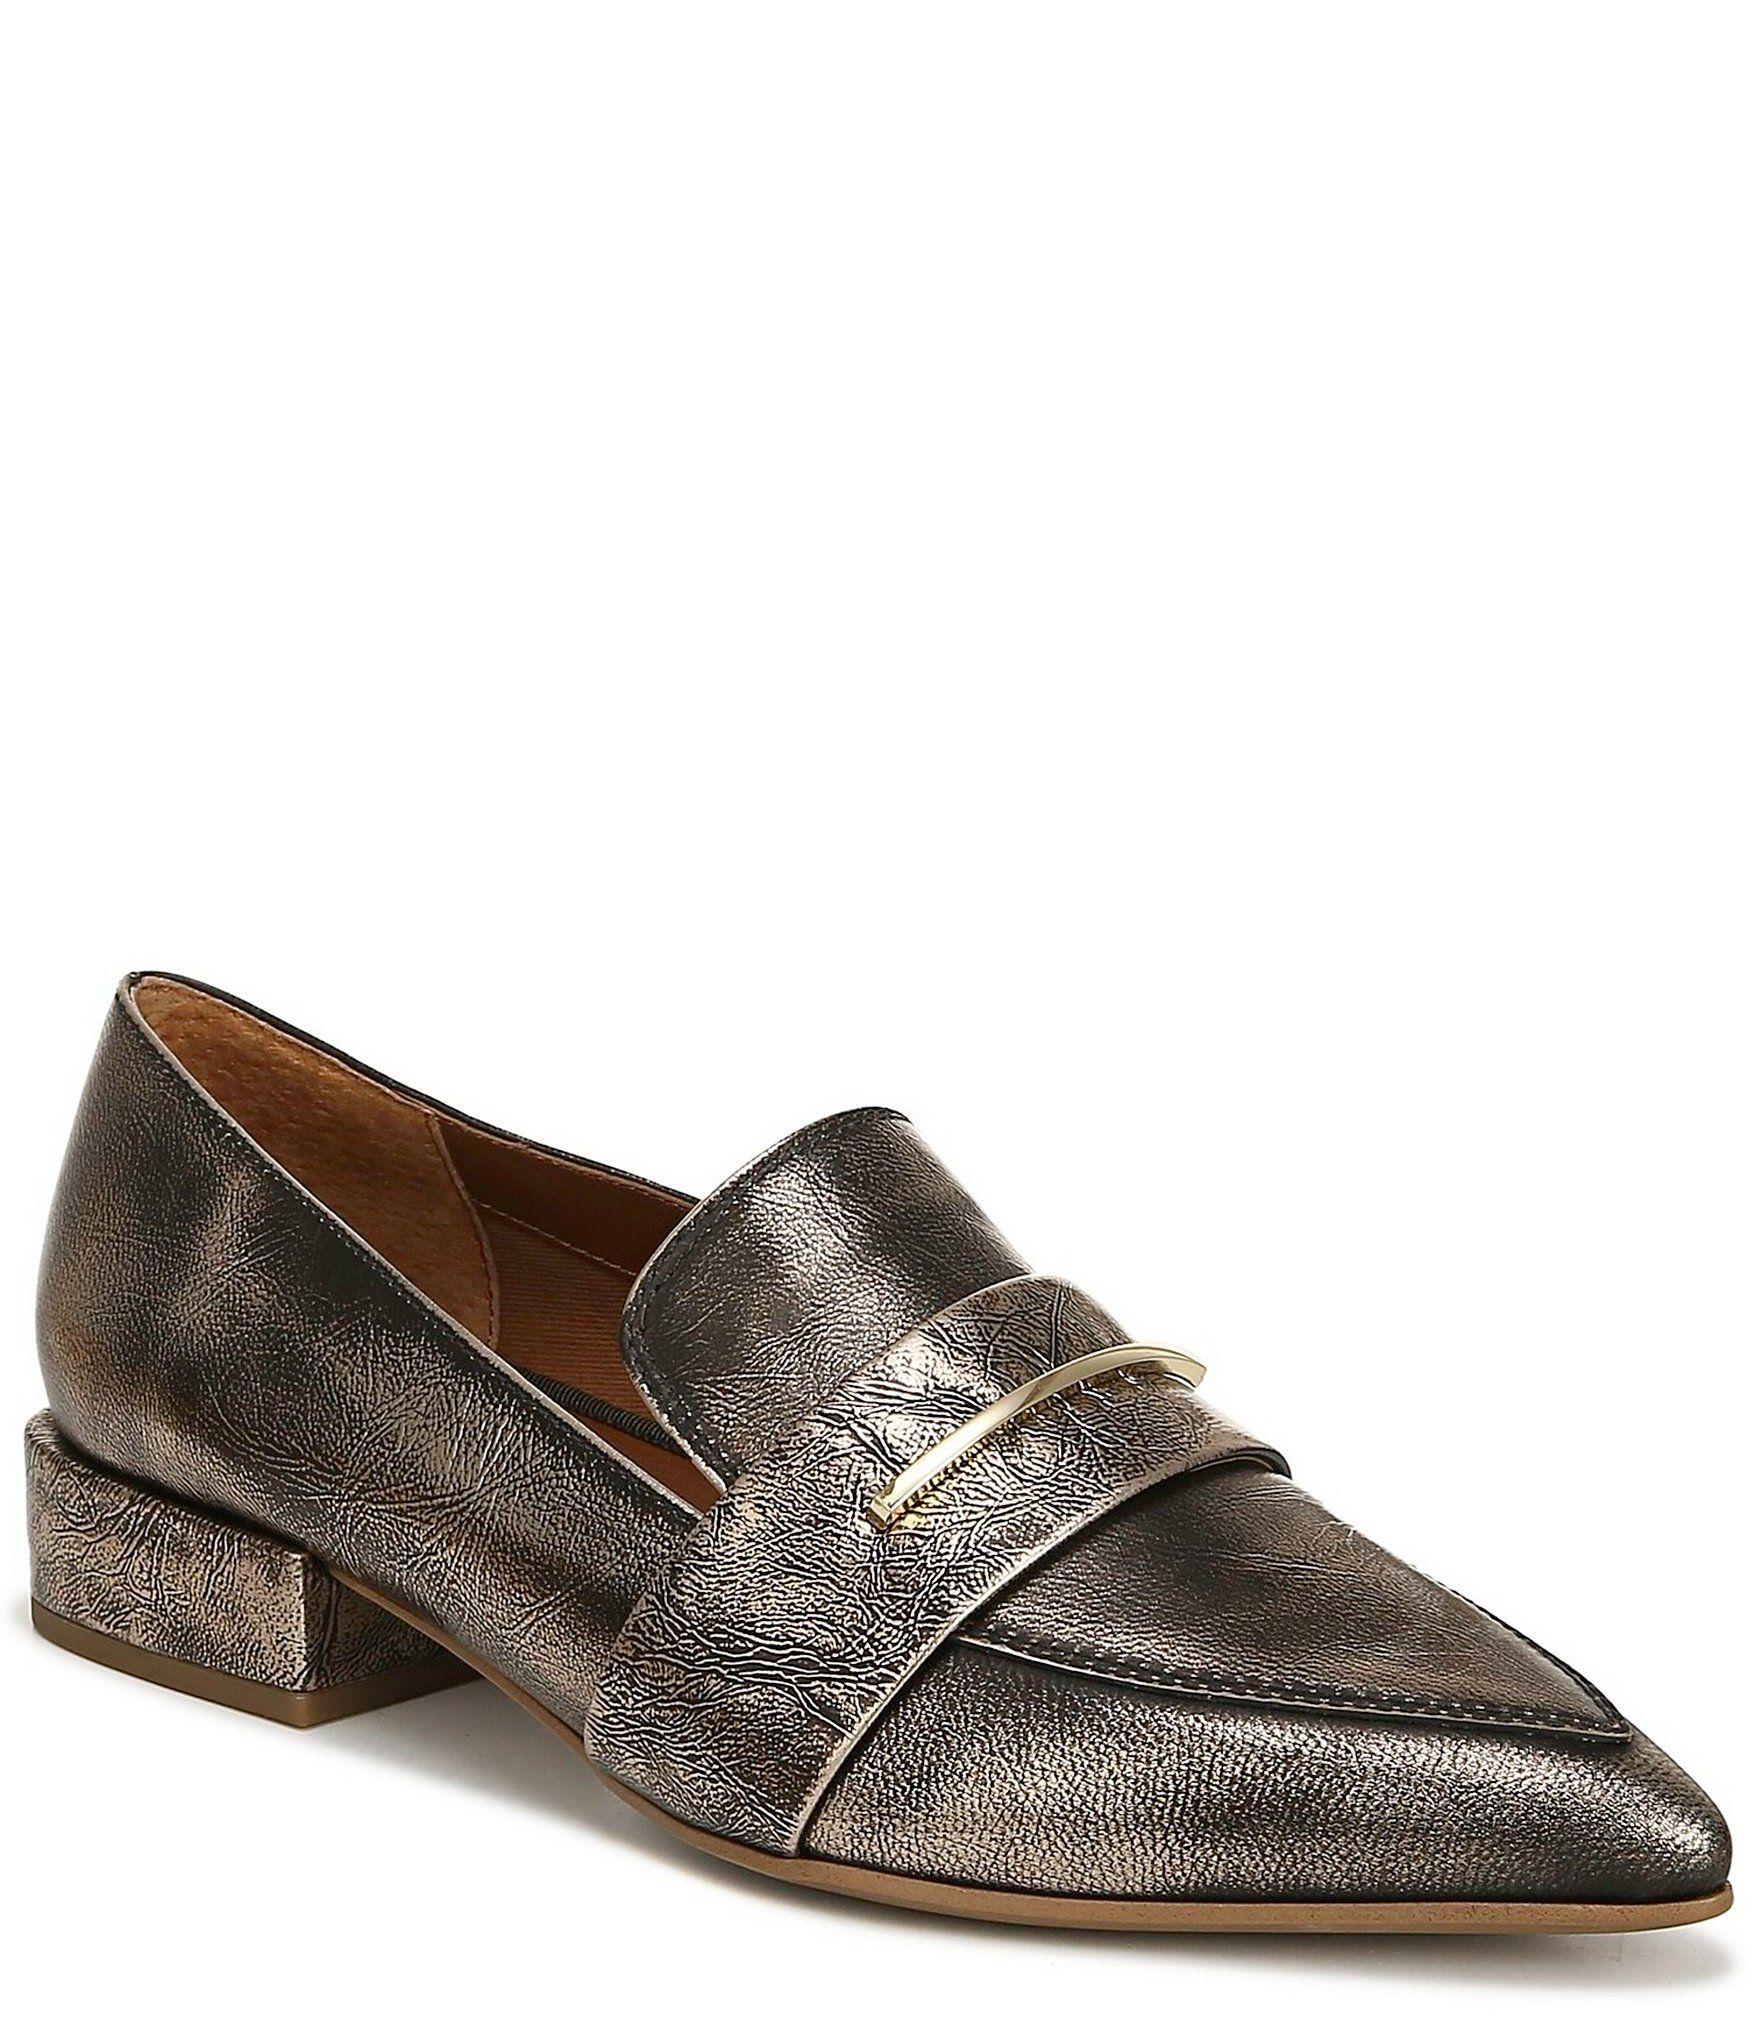 Franco Sarto Wynne Metallic Leather Block Heel Dress Loafers | Dillard's